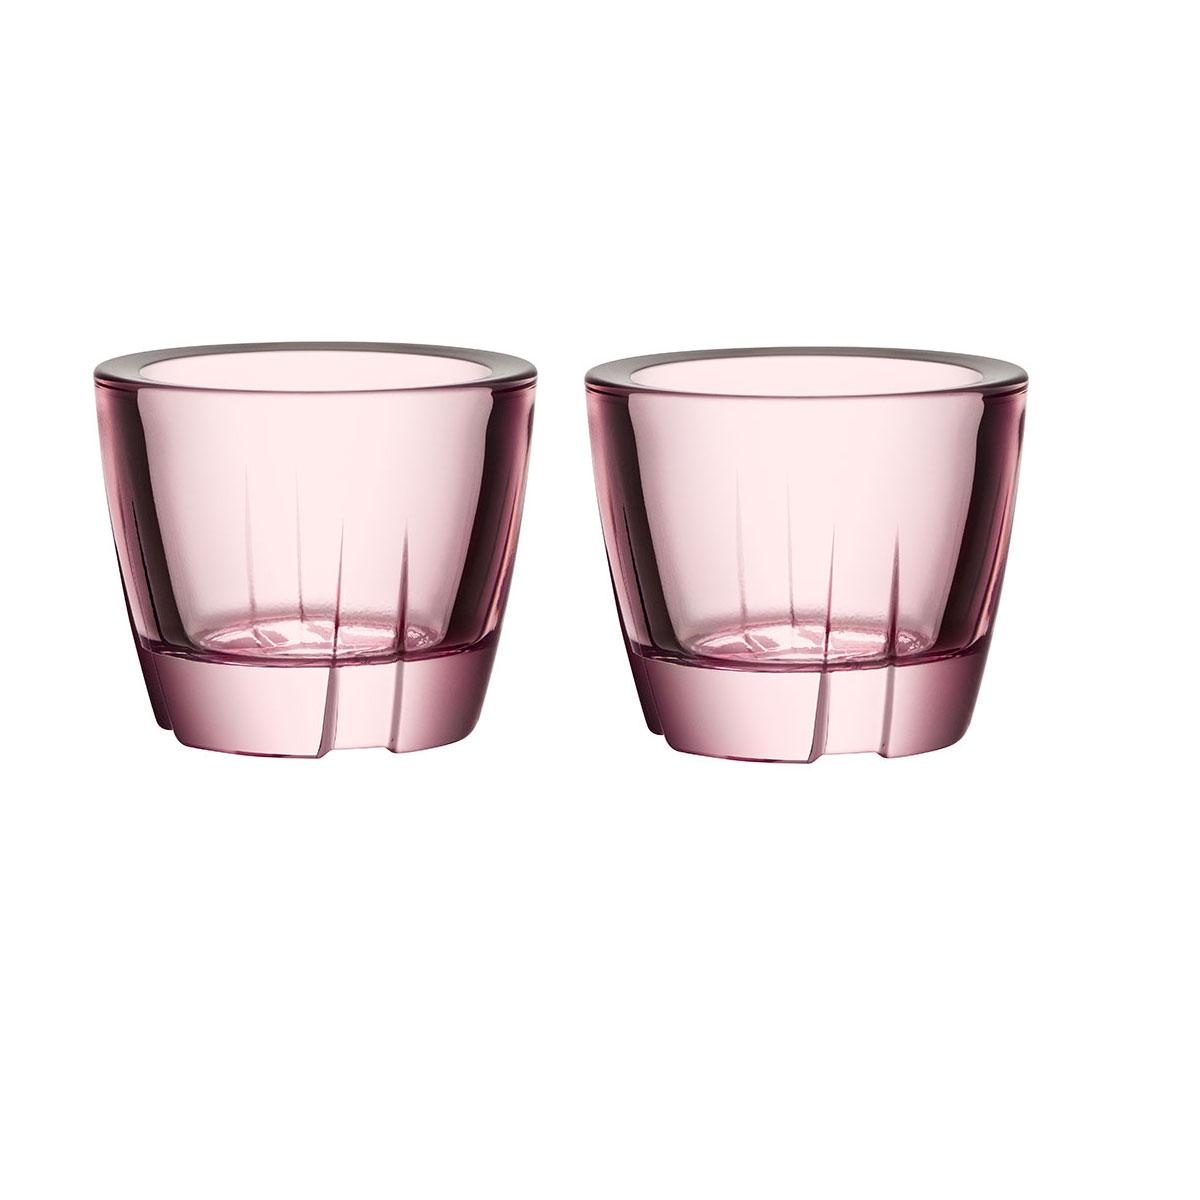 Kosta Boda Bruk Crystal Votive Light Pink Anything Crystal Bowl, Pair